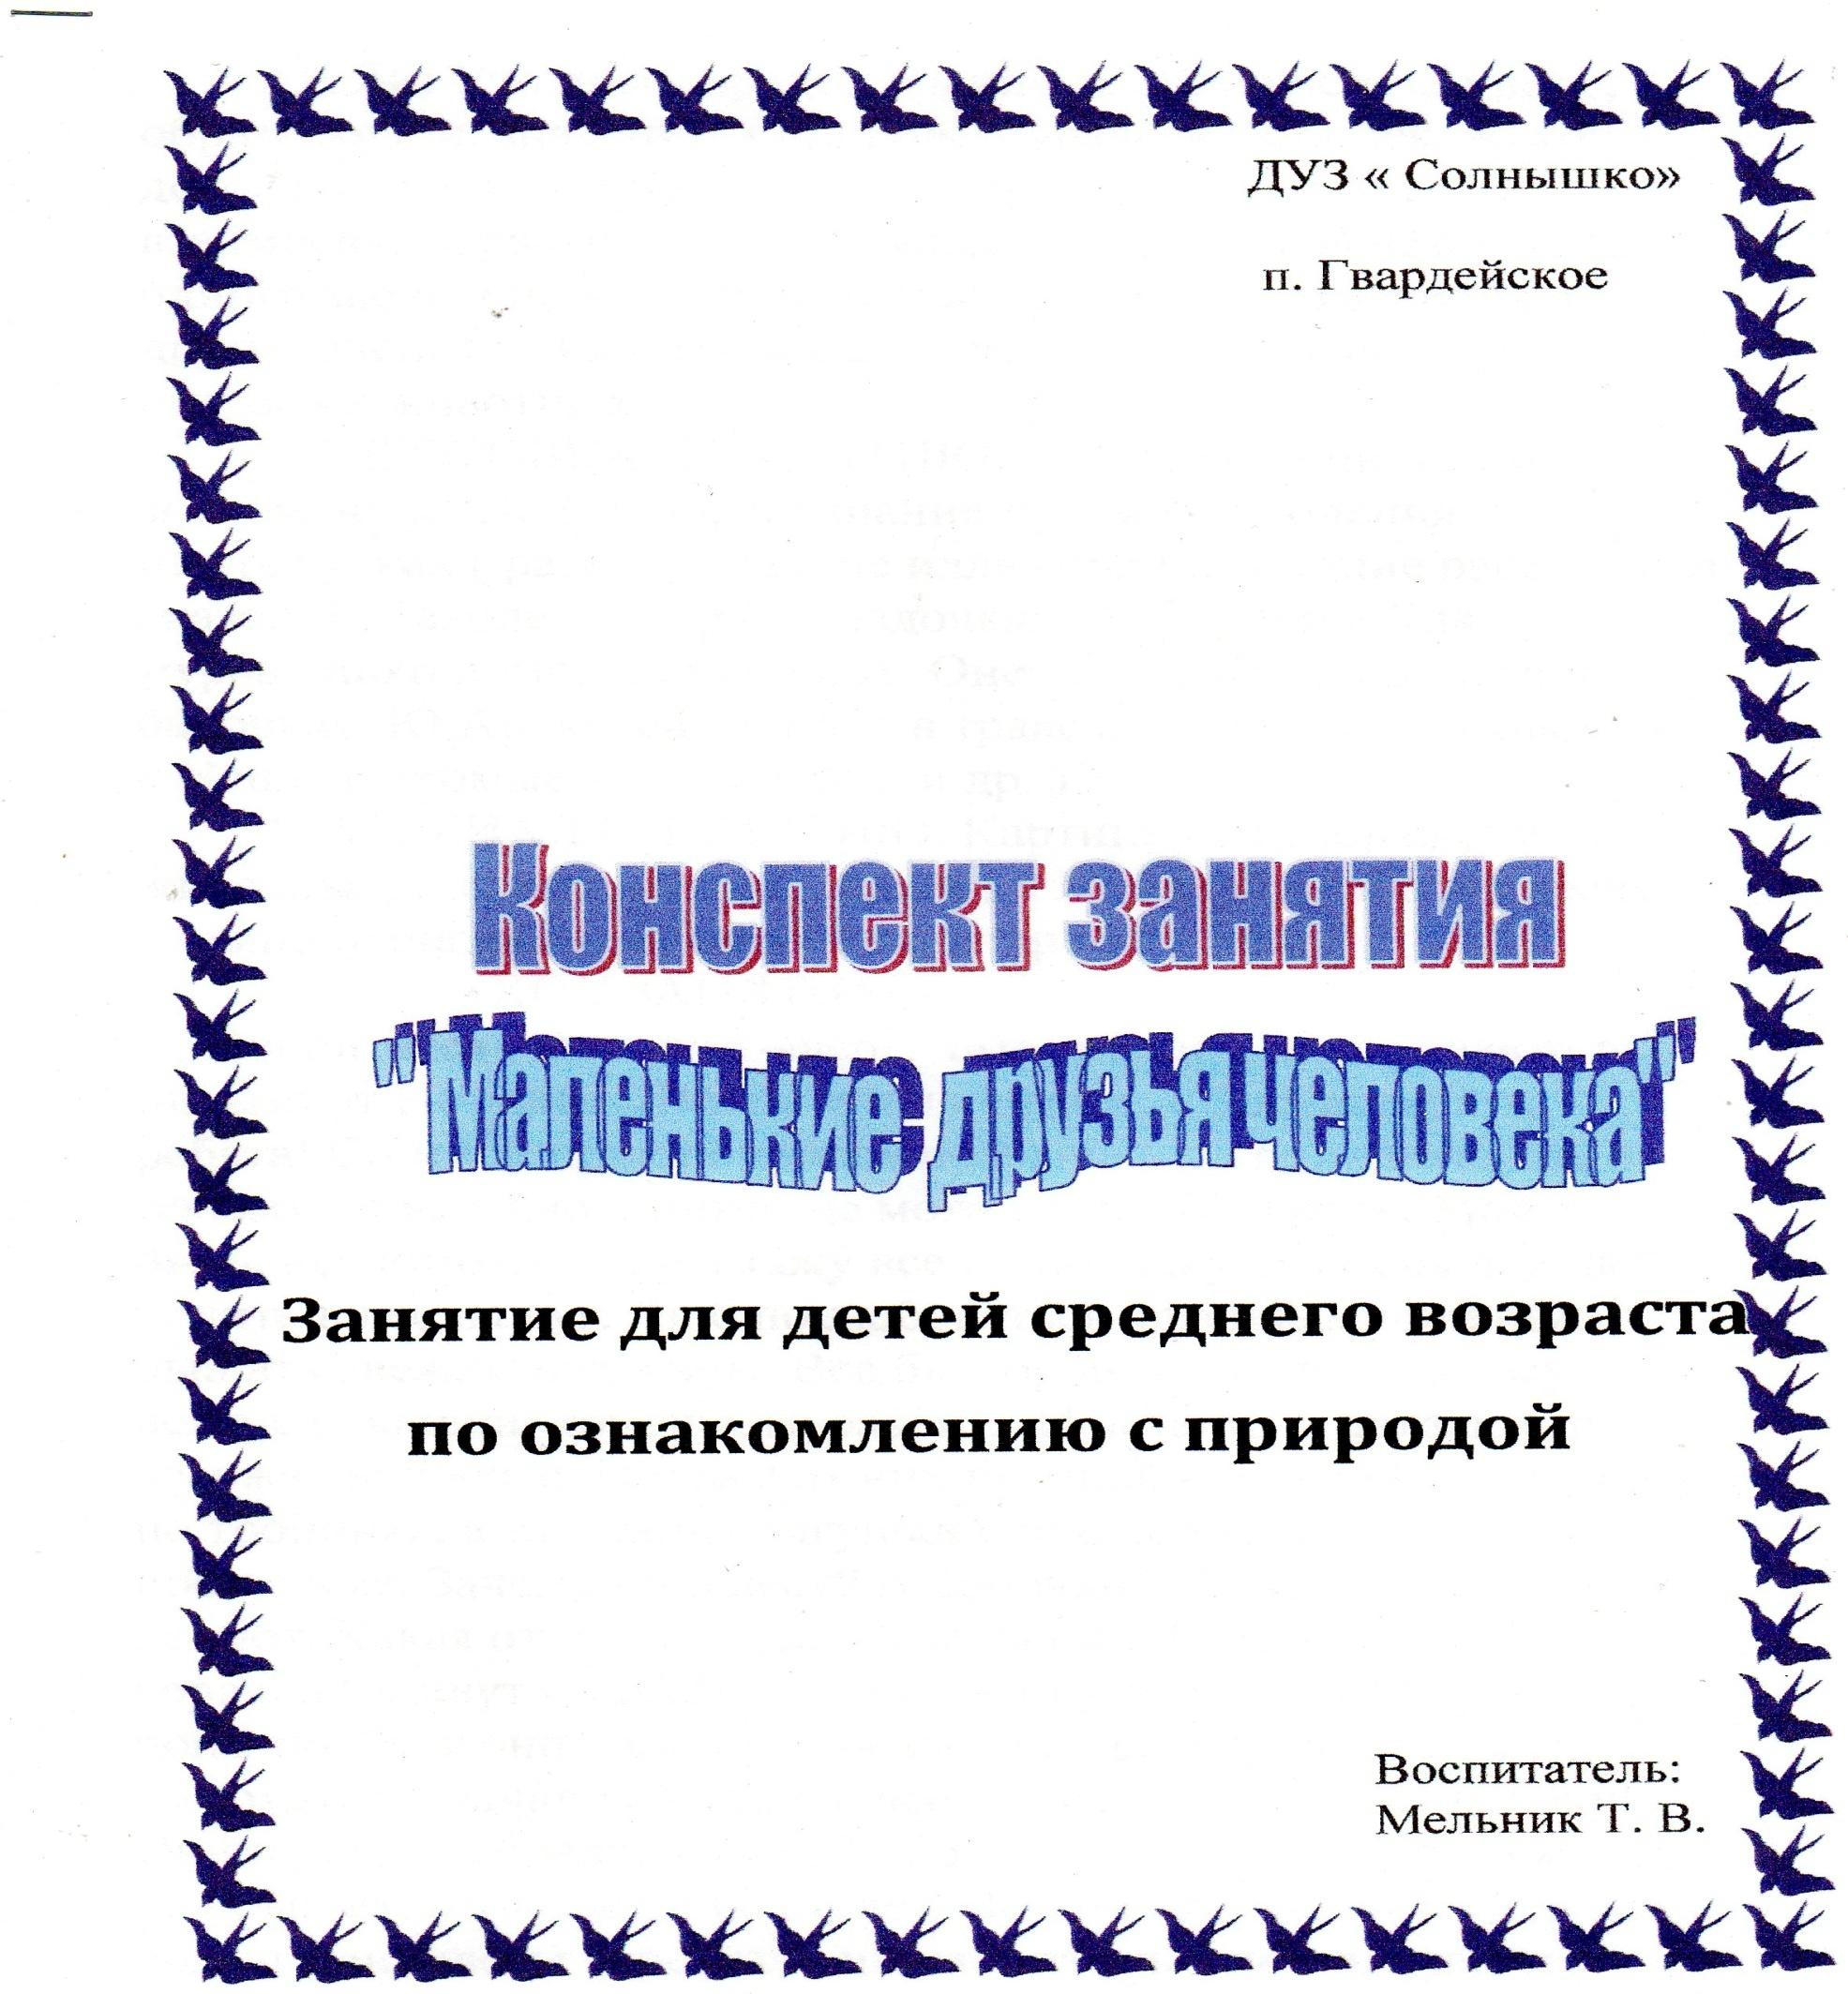 C:\Users\Александр\Pictures\img010.jpg